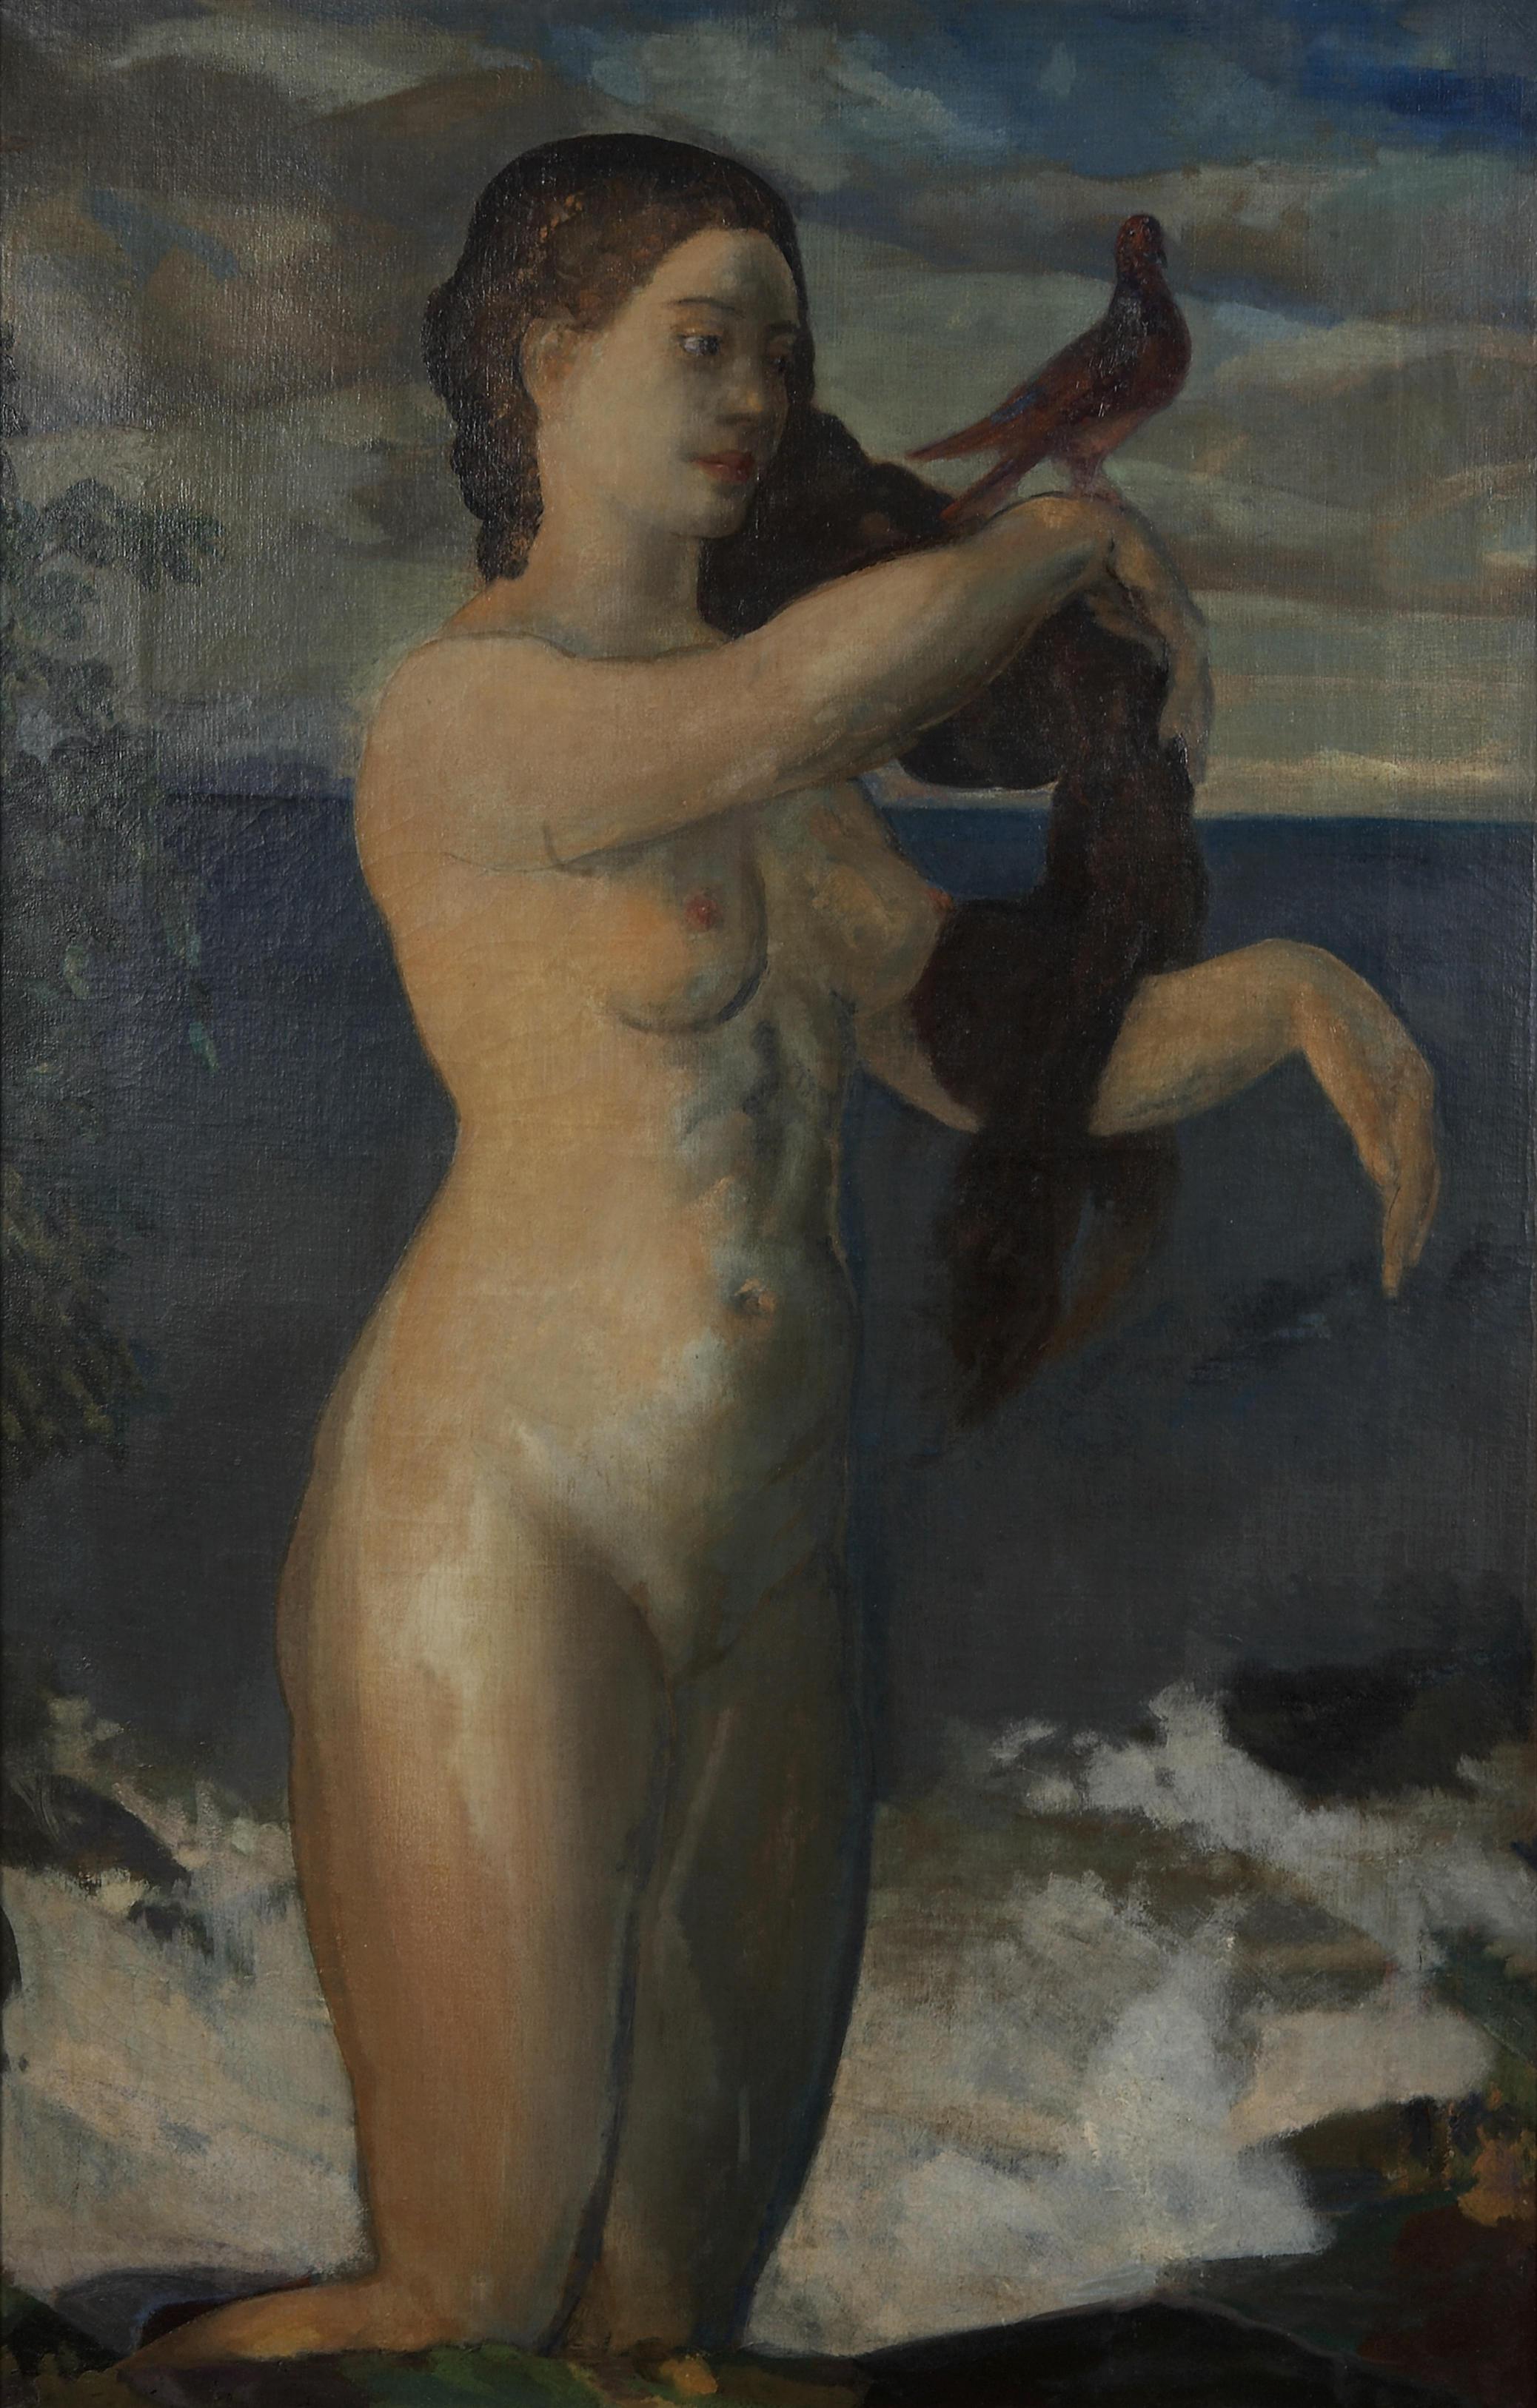 Arthur Bowen Davies, 1862-1928. Девушка и птица. Частная коллекция